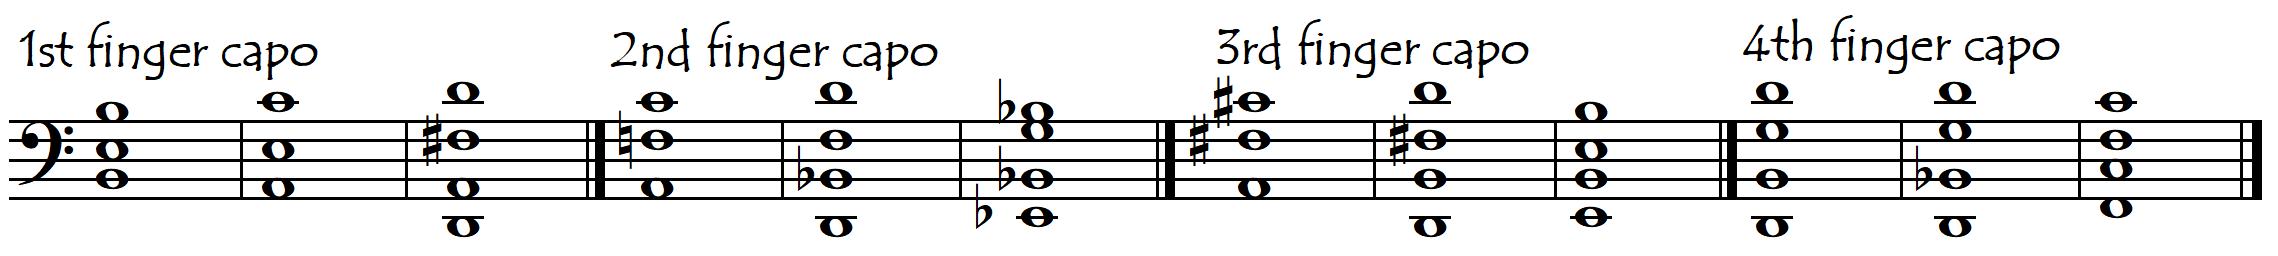 all fingers capo chords basic